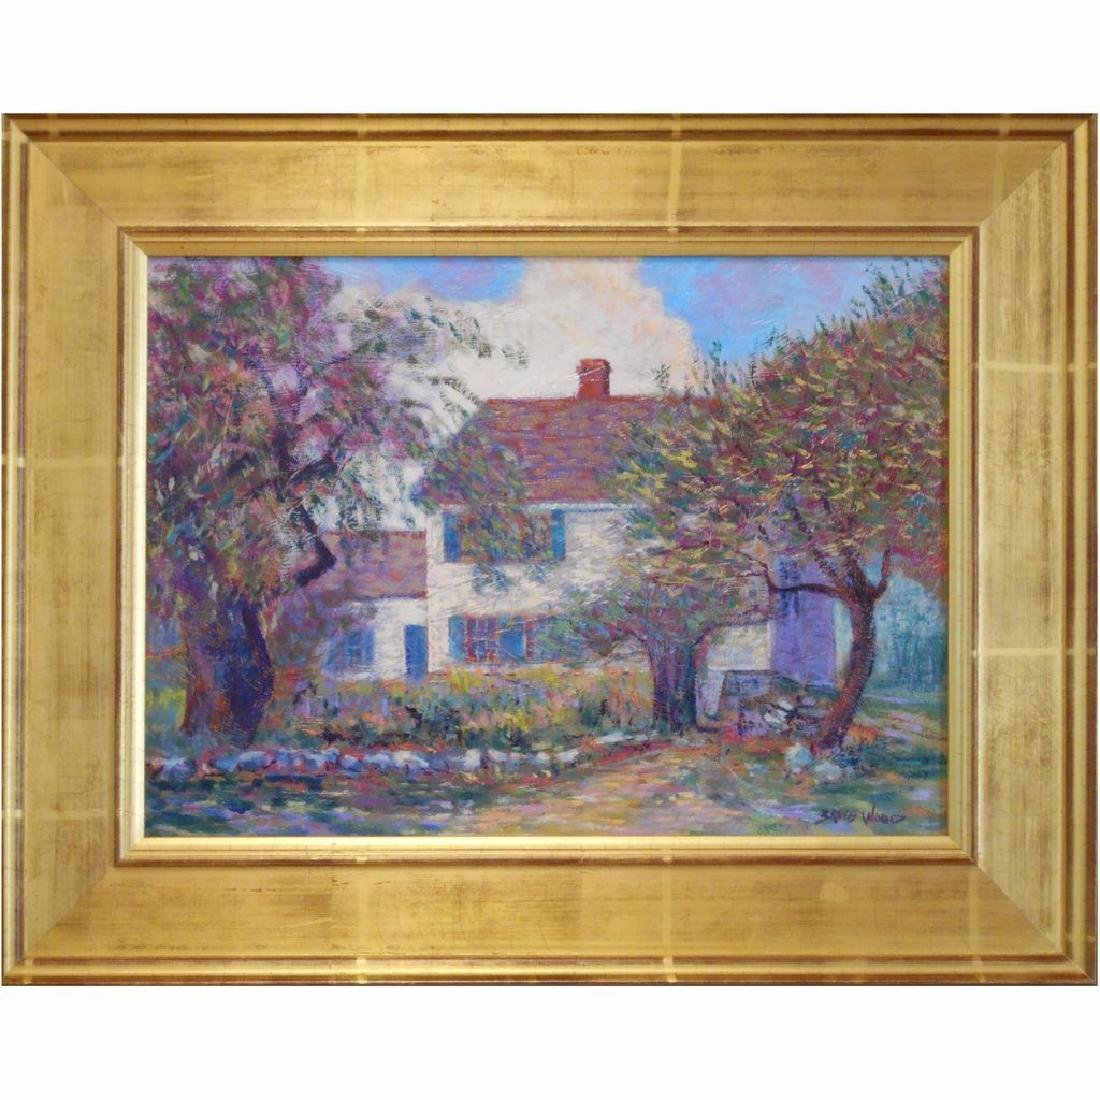 Plein Air Contemporary American Impressionist Landscape